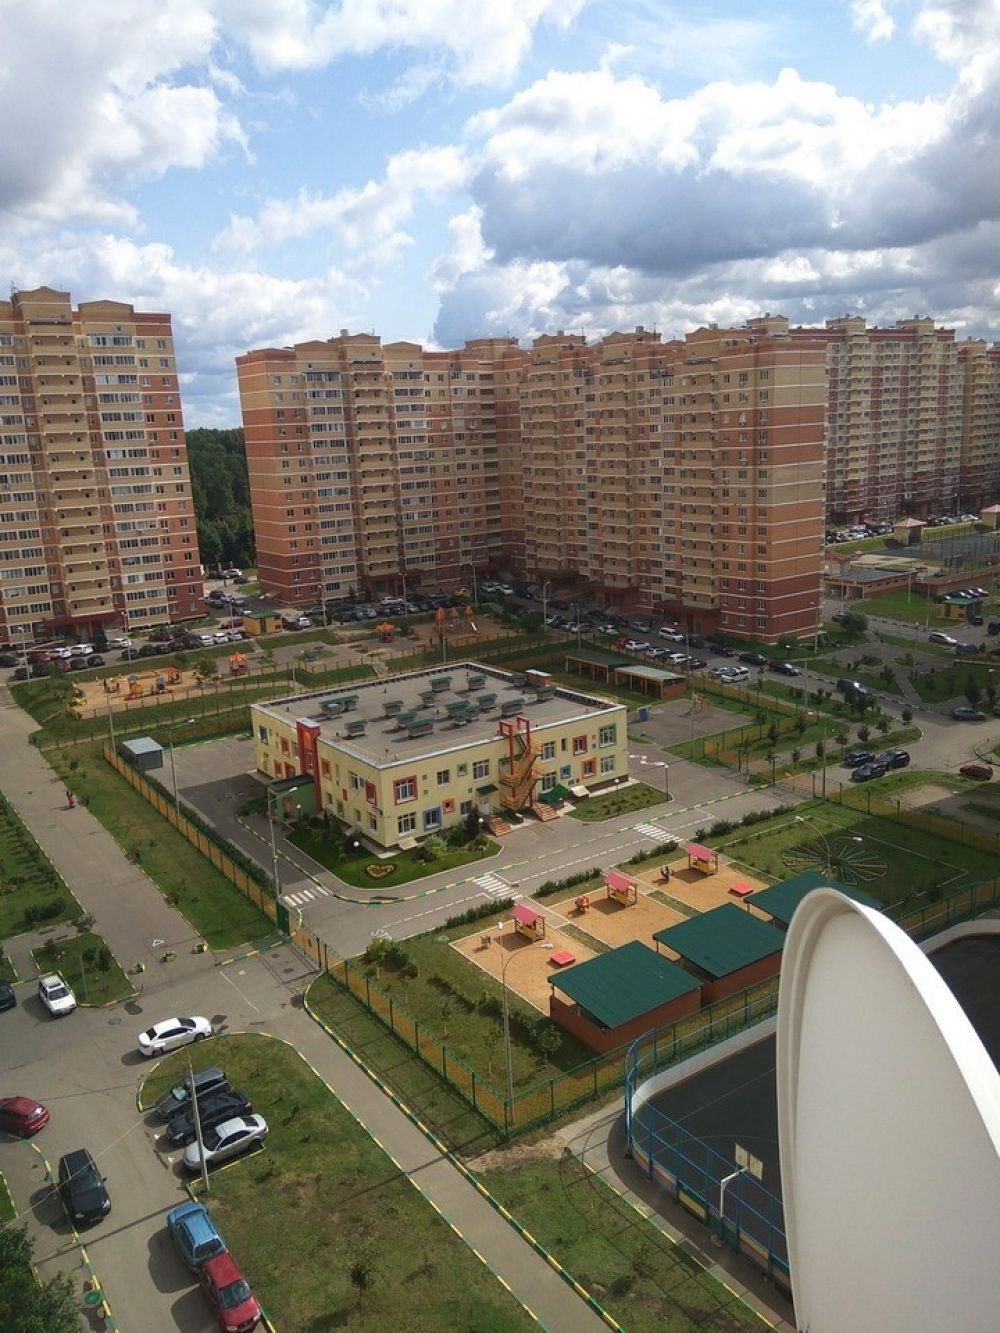 1-комнатная квартира 47.6 м2, г. Щелково, Богородский мкр,10, фото 14